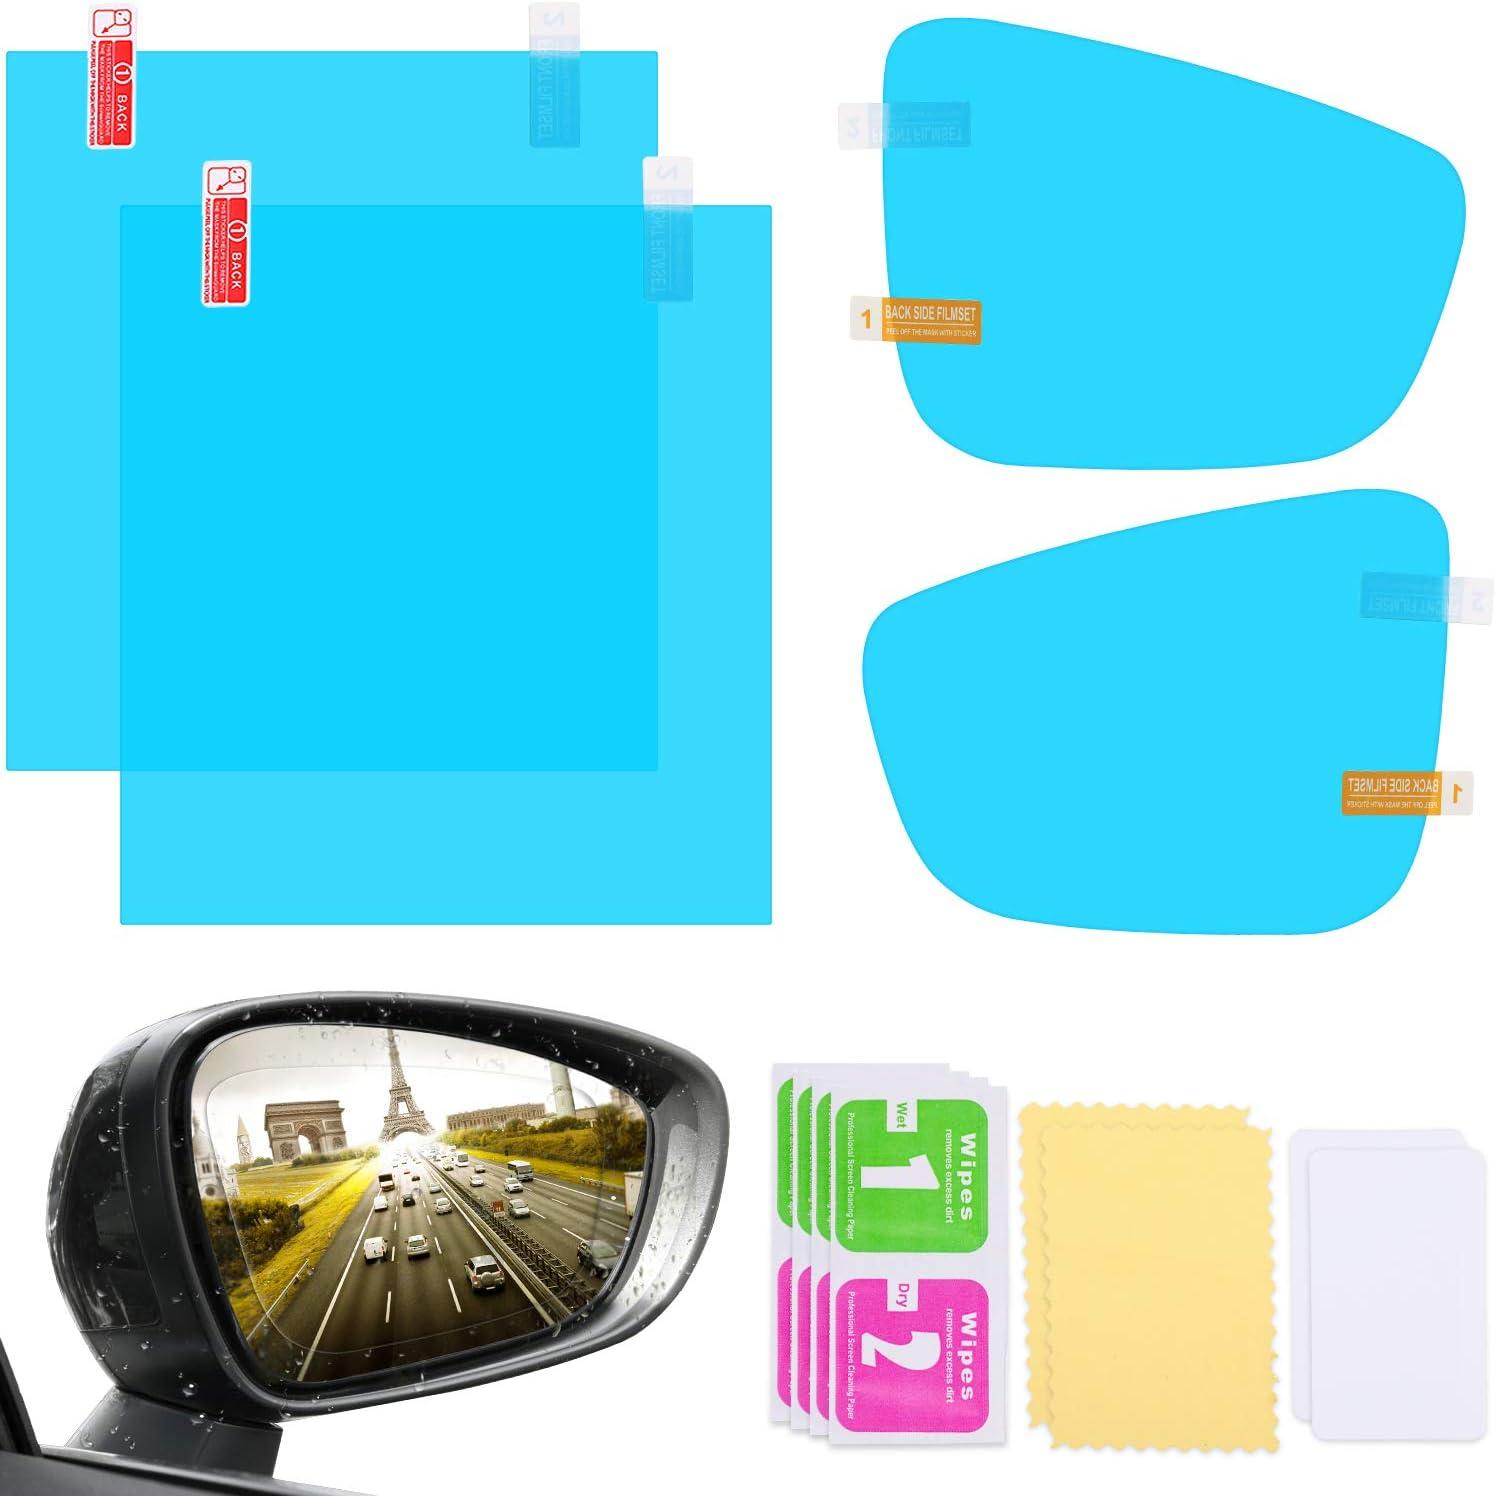 4 Pieces Car Rearview Mirror Film Rainproof Waterproof Mirror Film Anti Fog HD Clear Nano Coating Car Film for Car Rear View Mirrors Side Windows